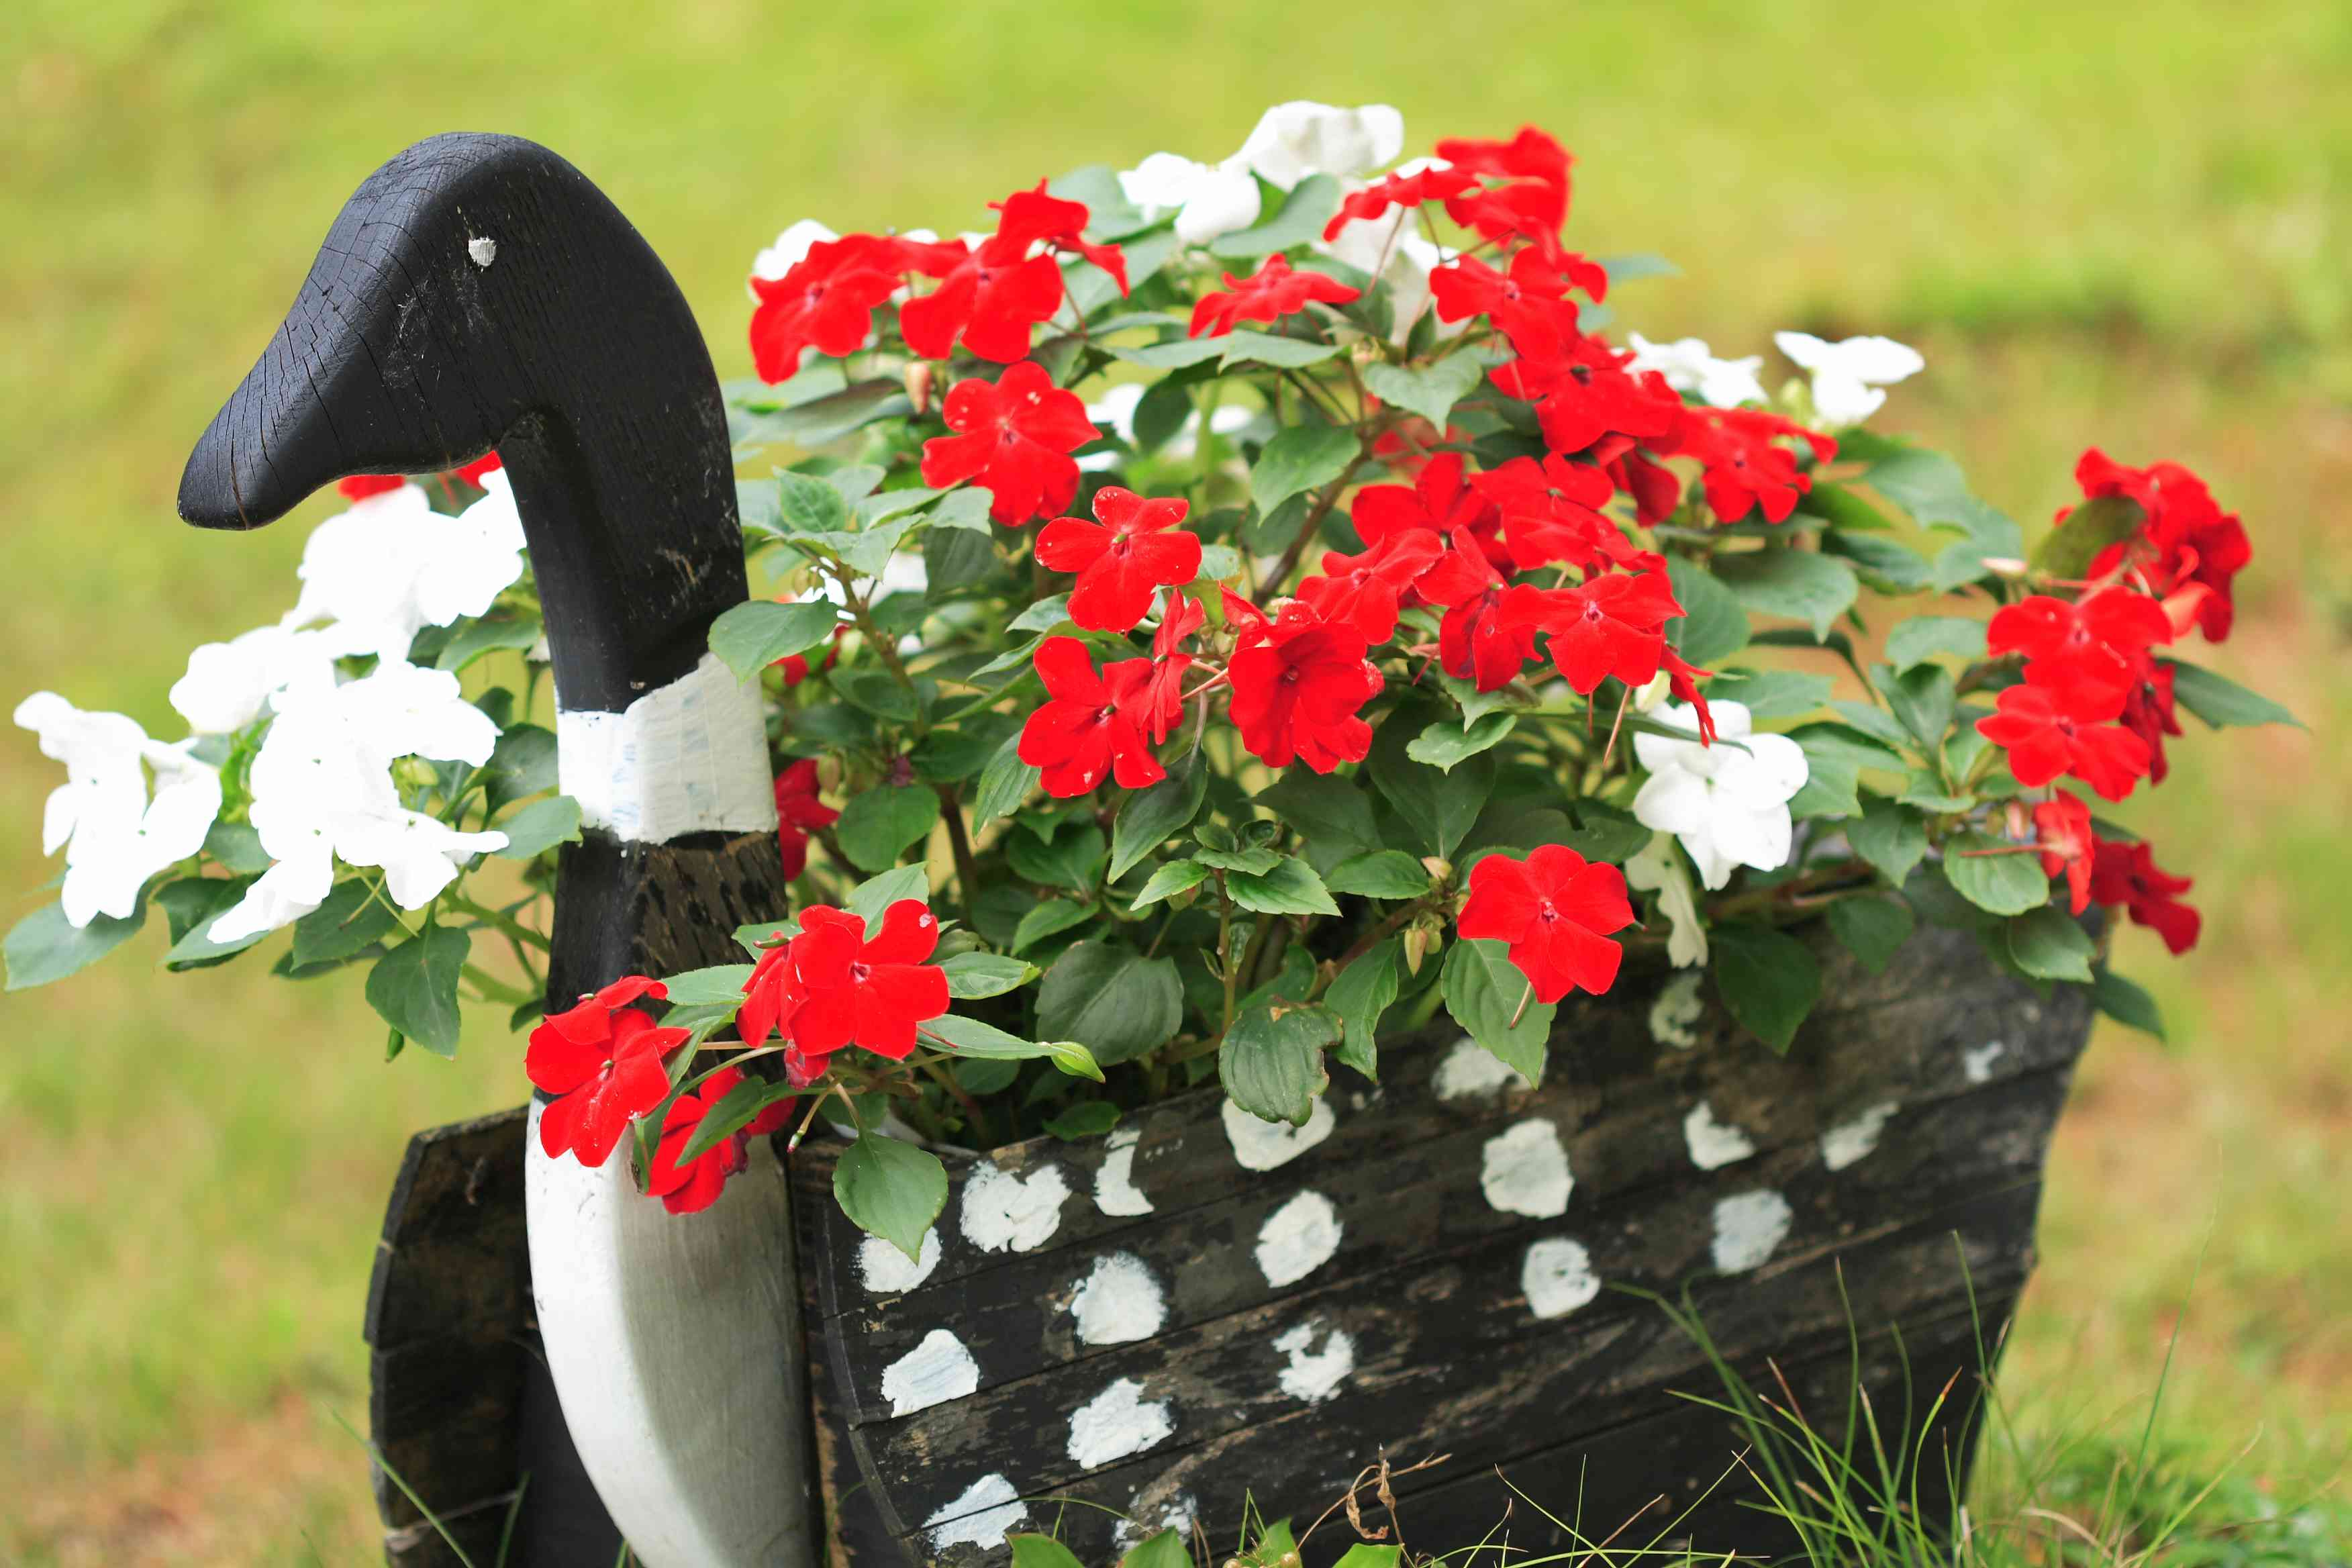 Loon Flower Basket